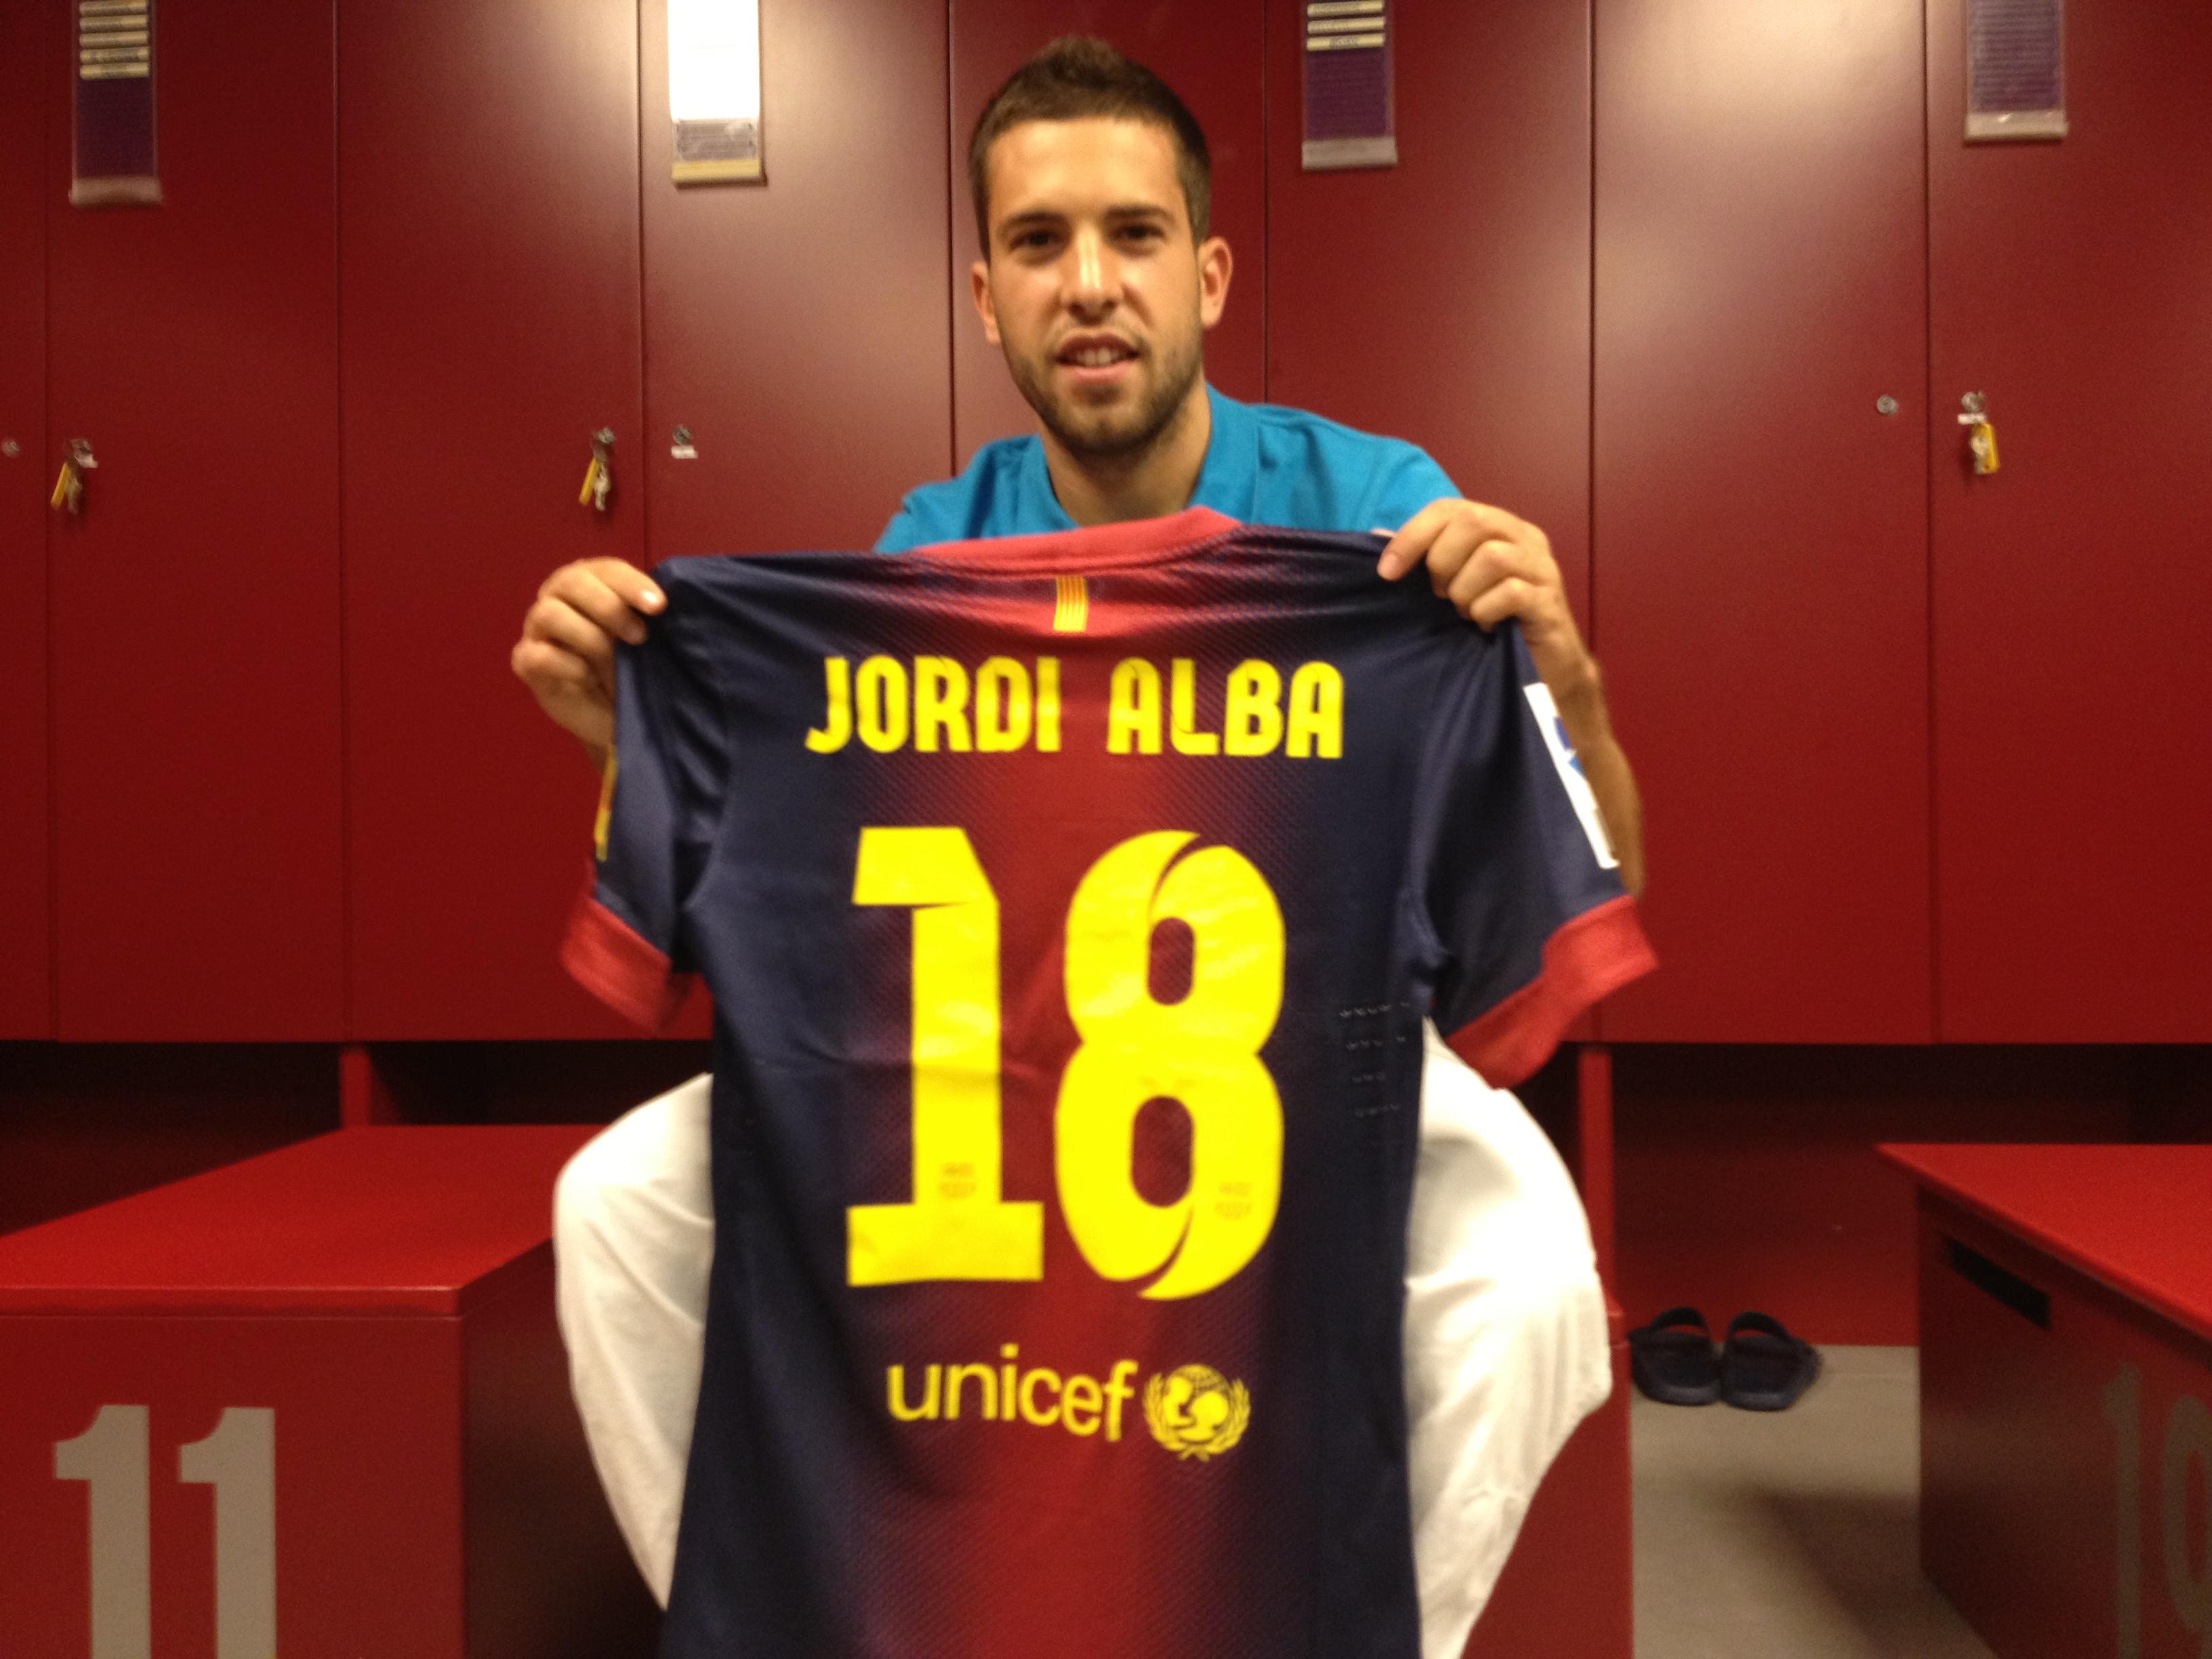 Barcelone : Jordi Alba prolonge jusqu'en 2020.